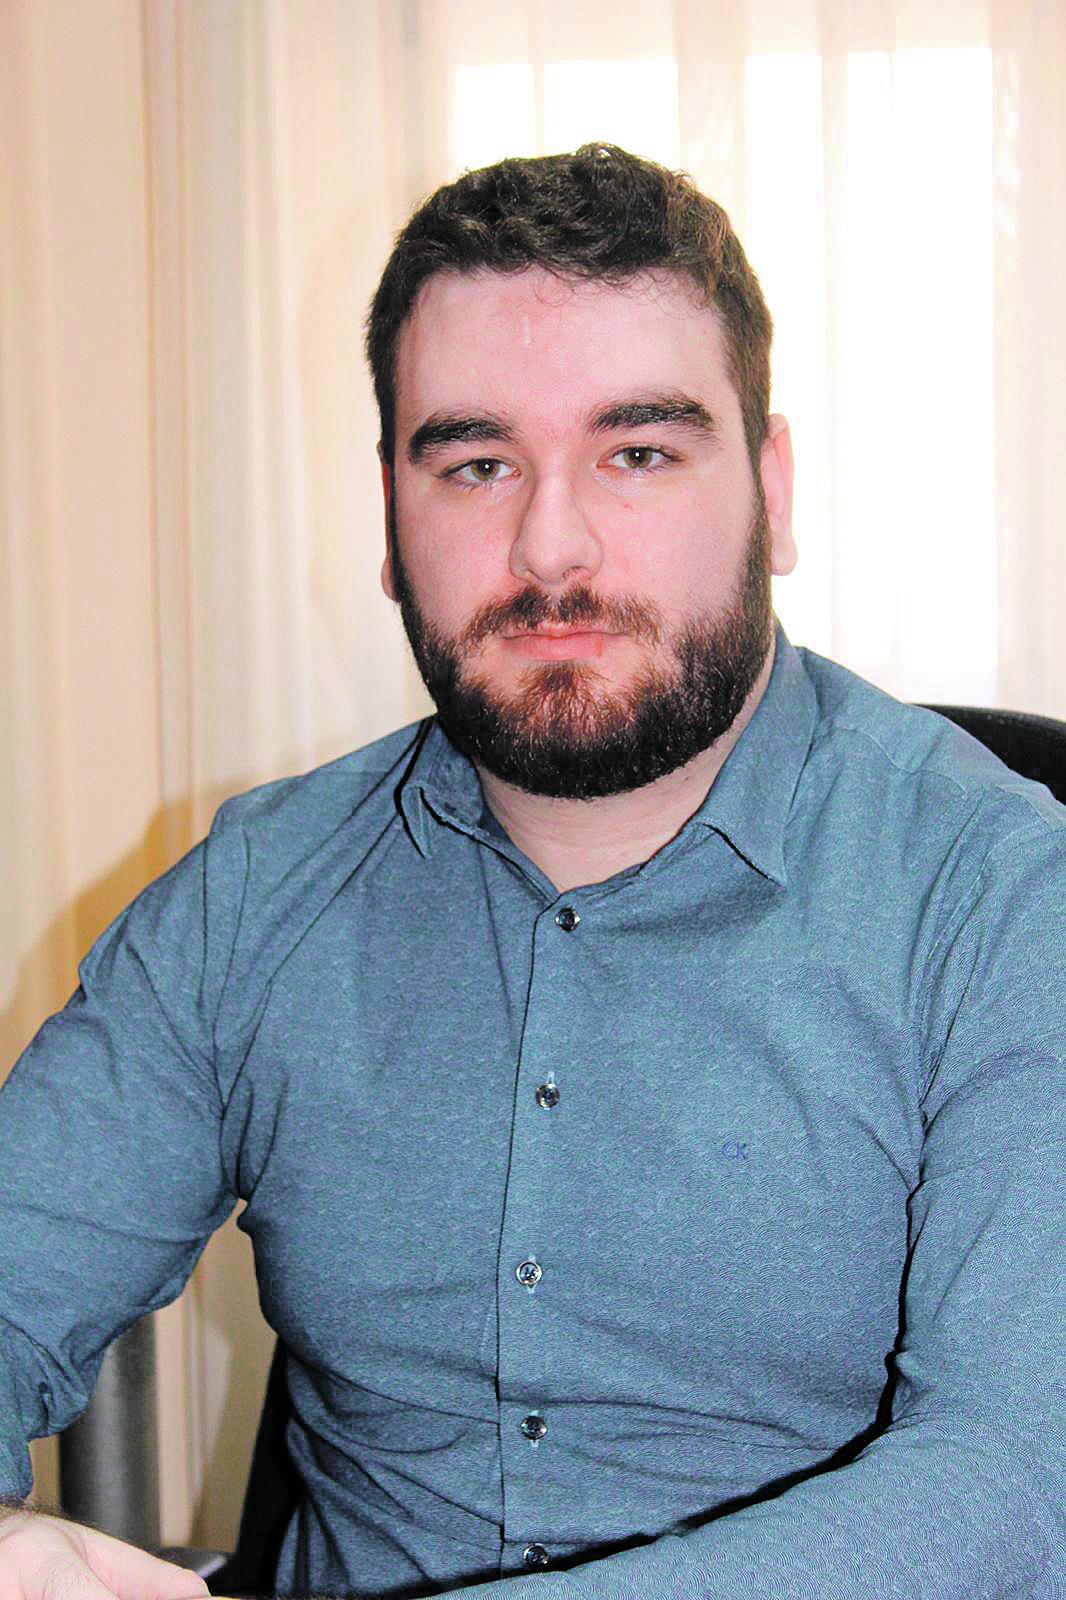 raul adam regidor Serveis Publics i Patrimoni agencis prensa2 carlos bueno